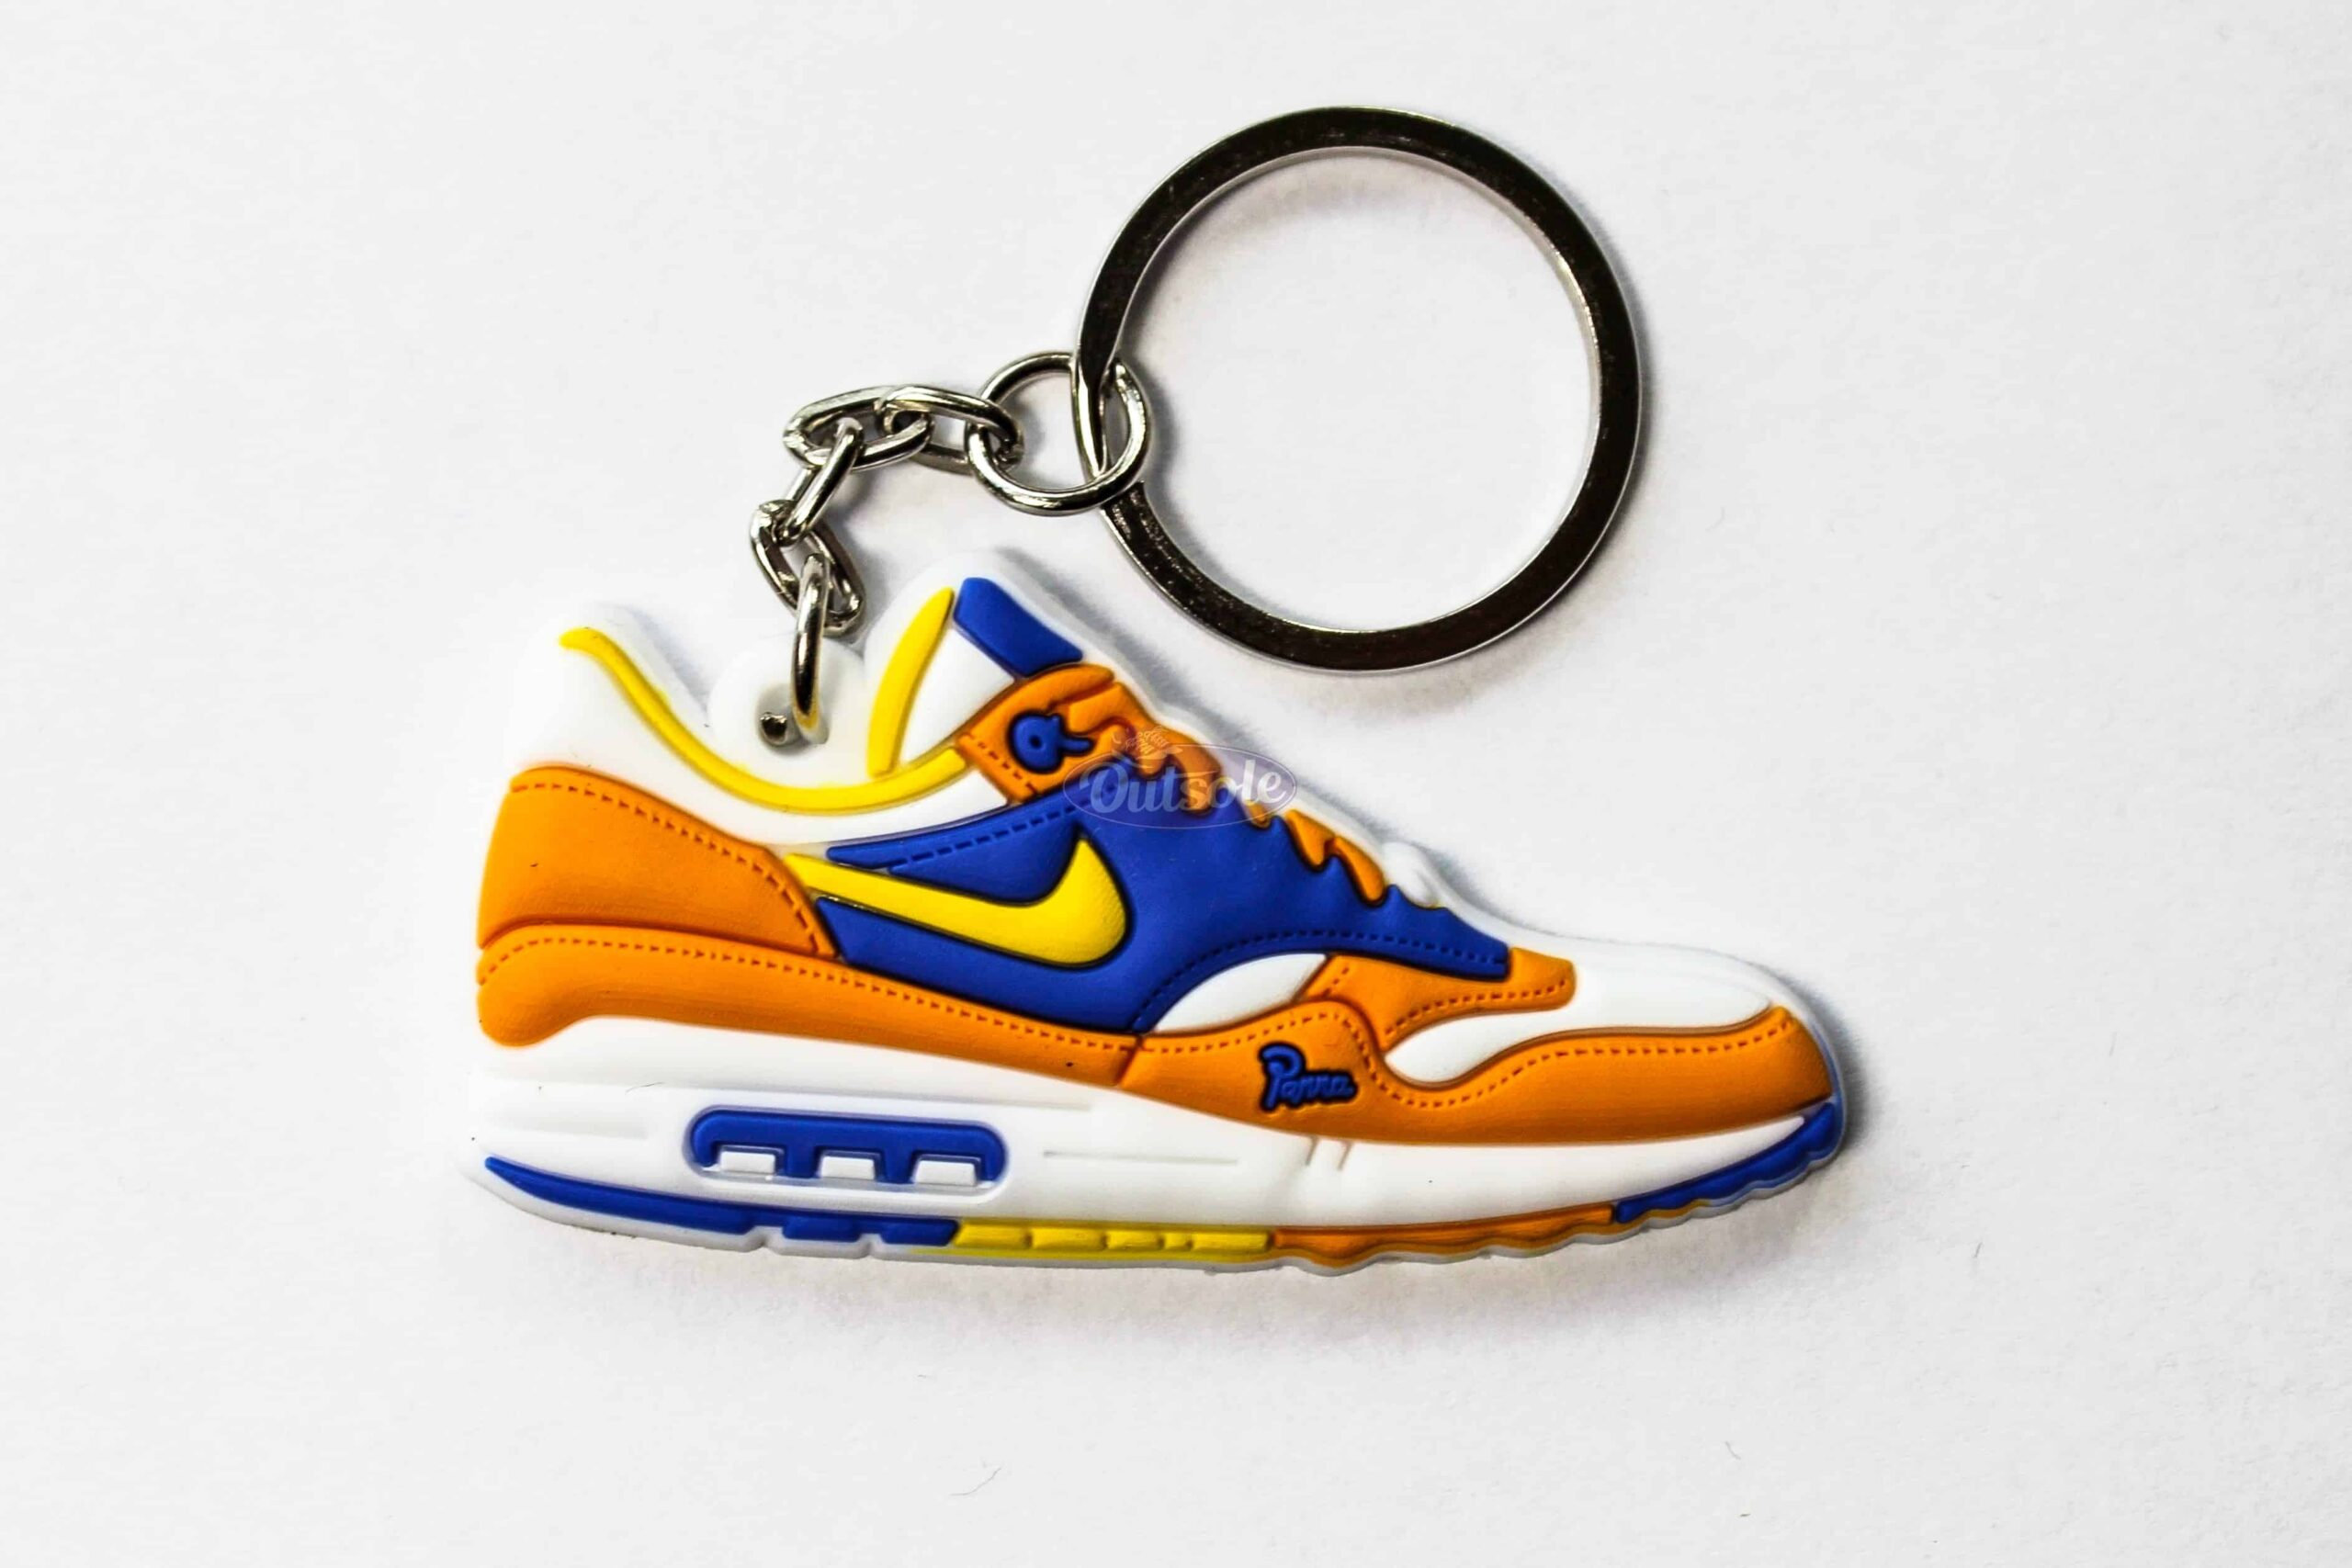 Nike Air Max 1 Albert Heijn keychain